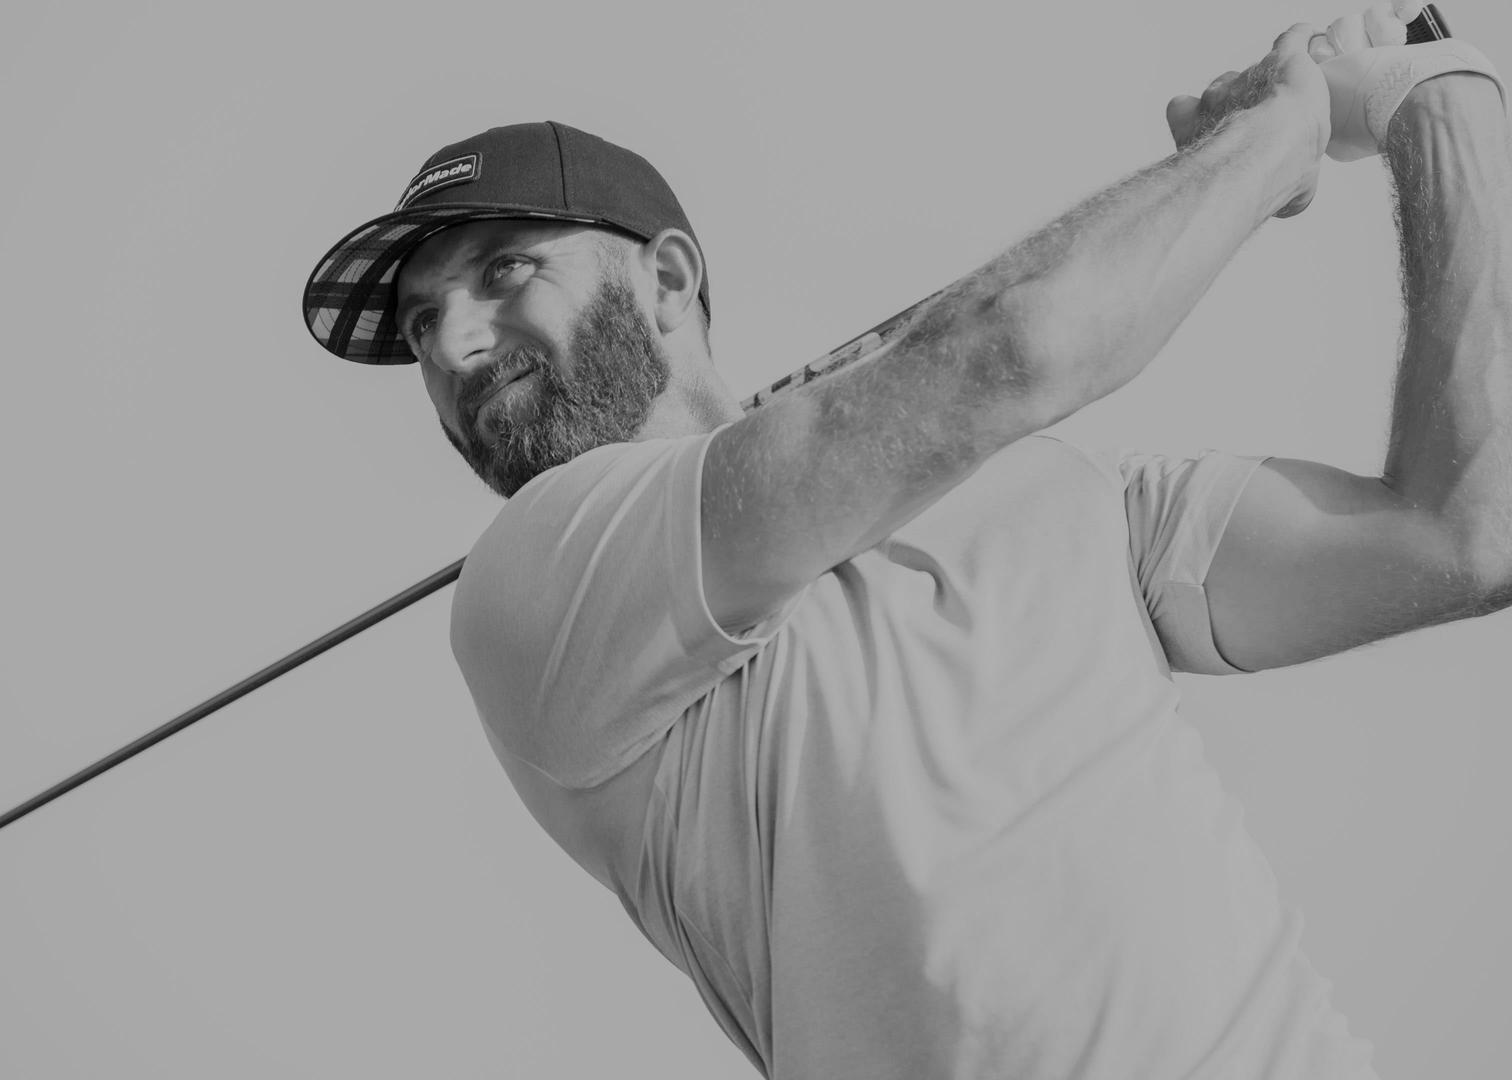 <p><strong>5.</strong> <em>Adidas Golf: Dustin Johnson</em></p>